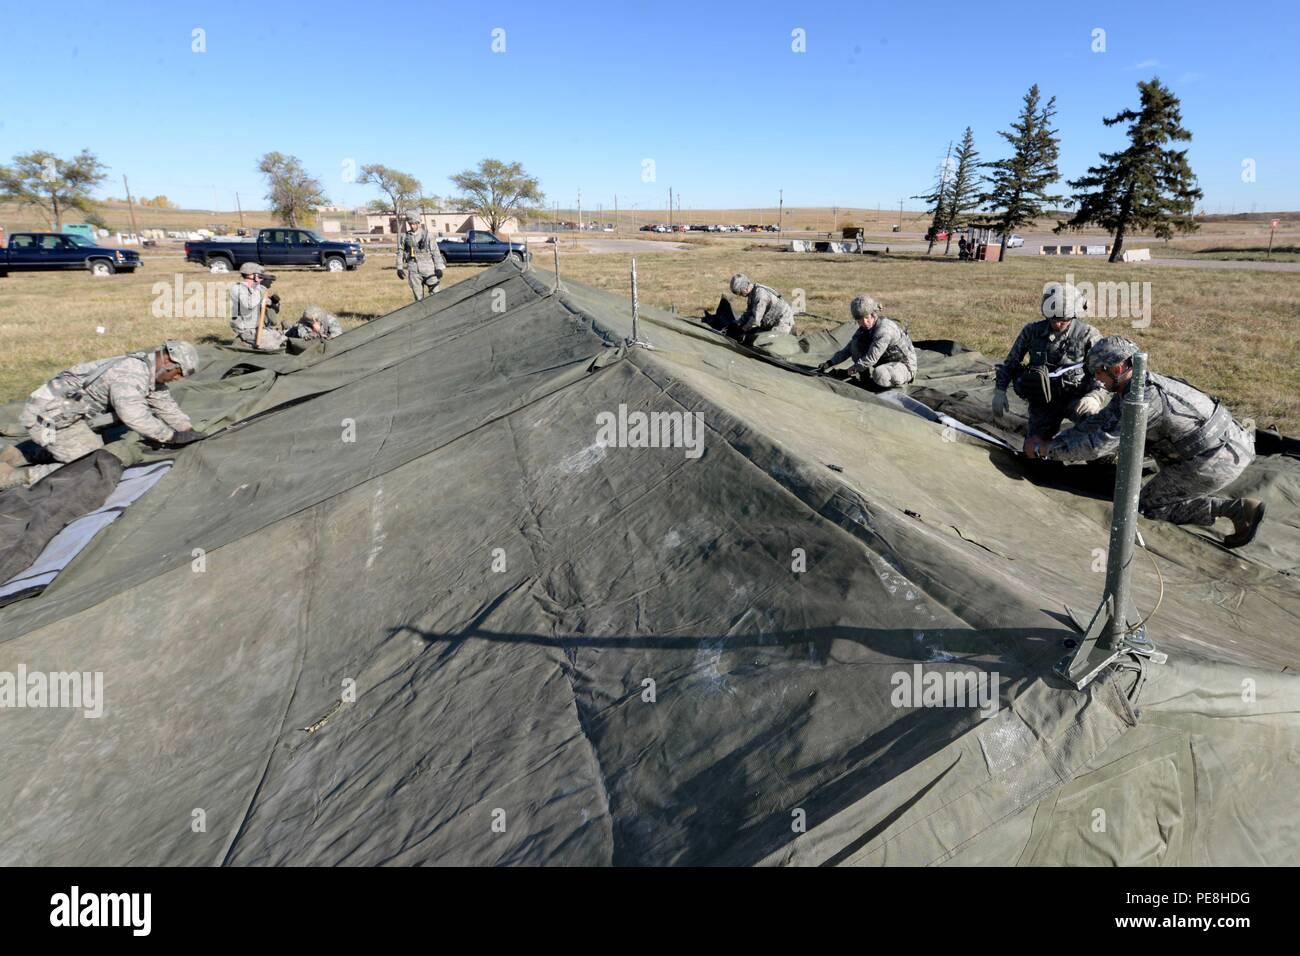 Temper Tent Stock Photos & Temper Tent Stock Images - Alamy